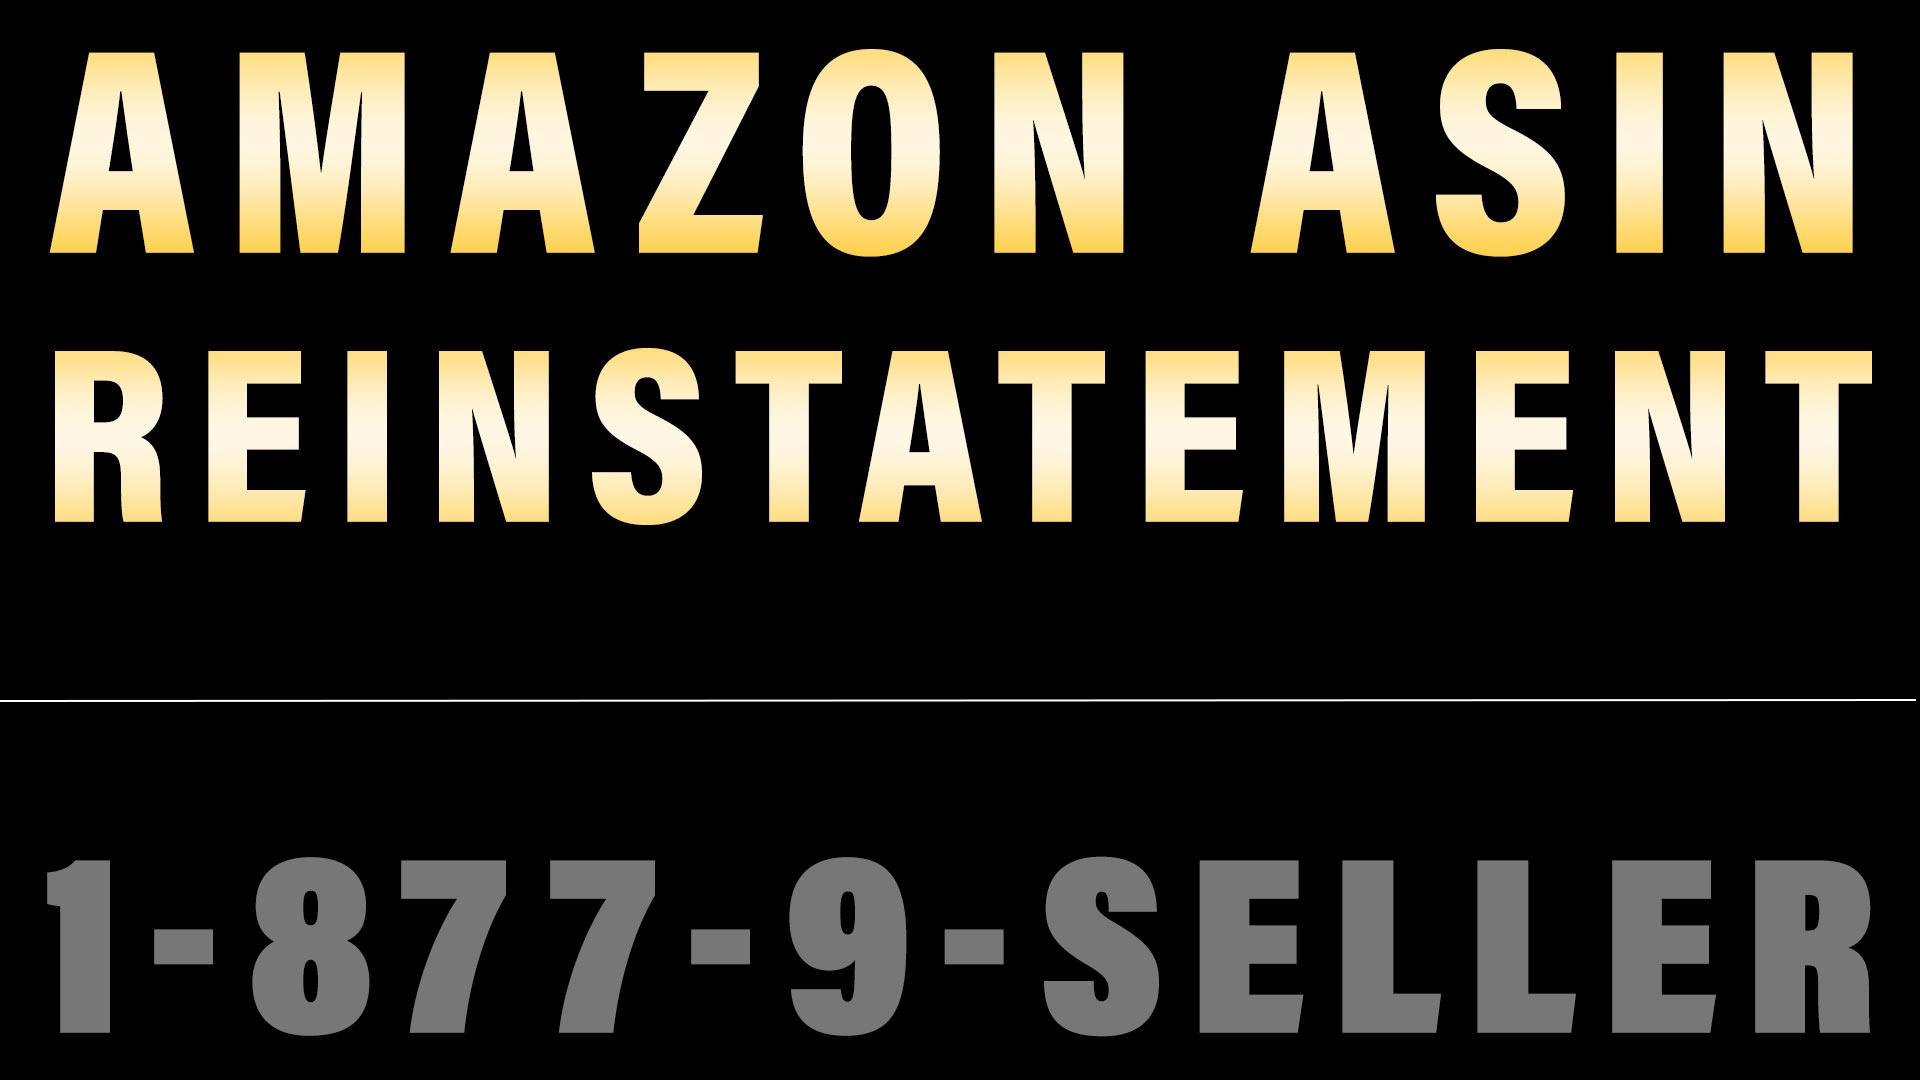 Suspended Amazon ASIN Reinstatement